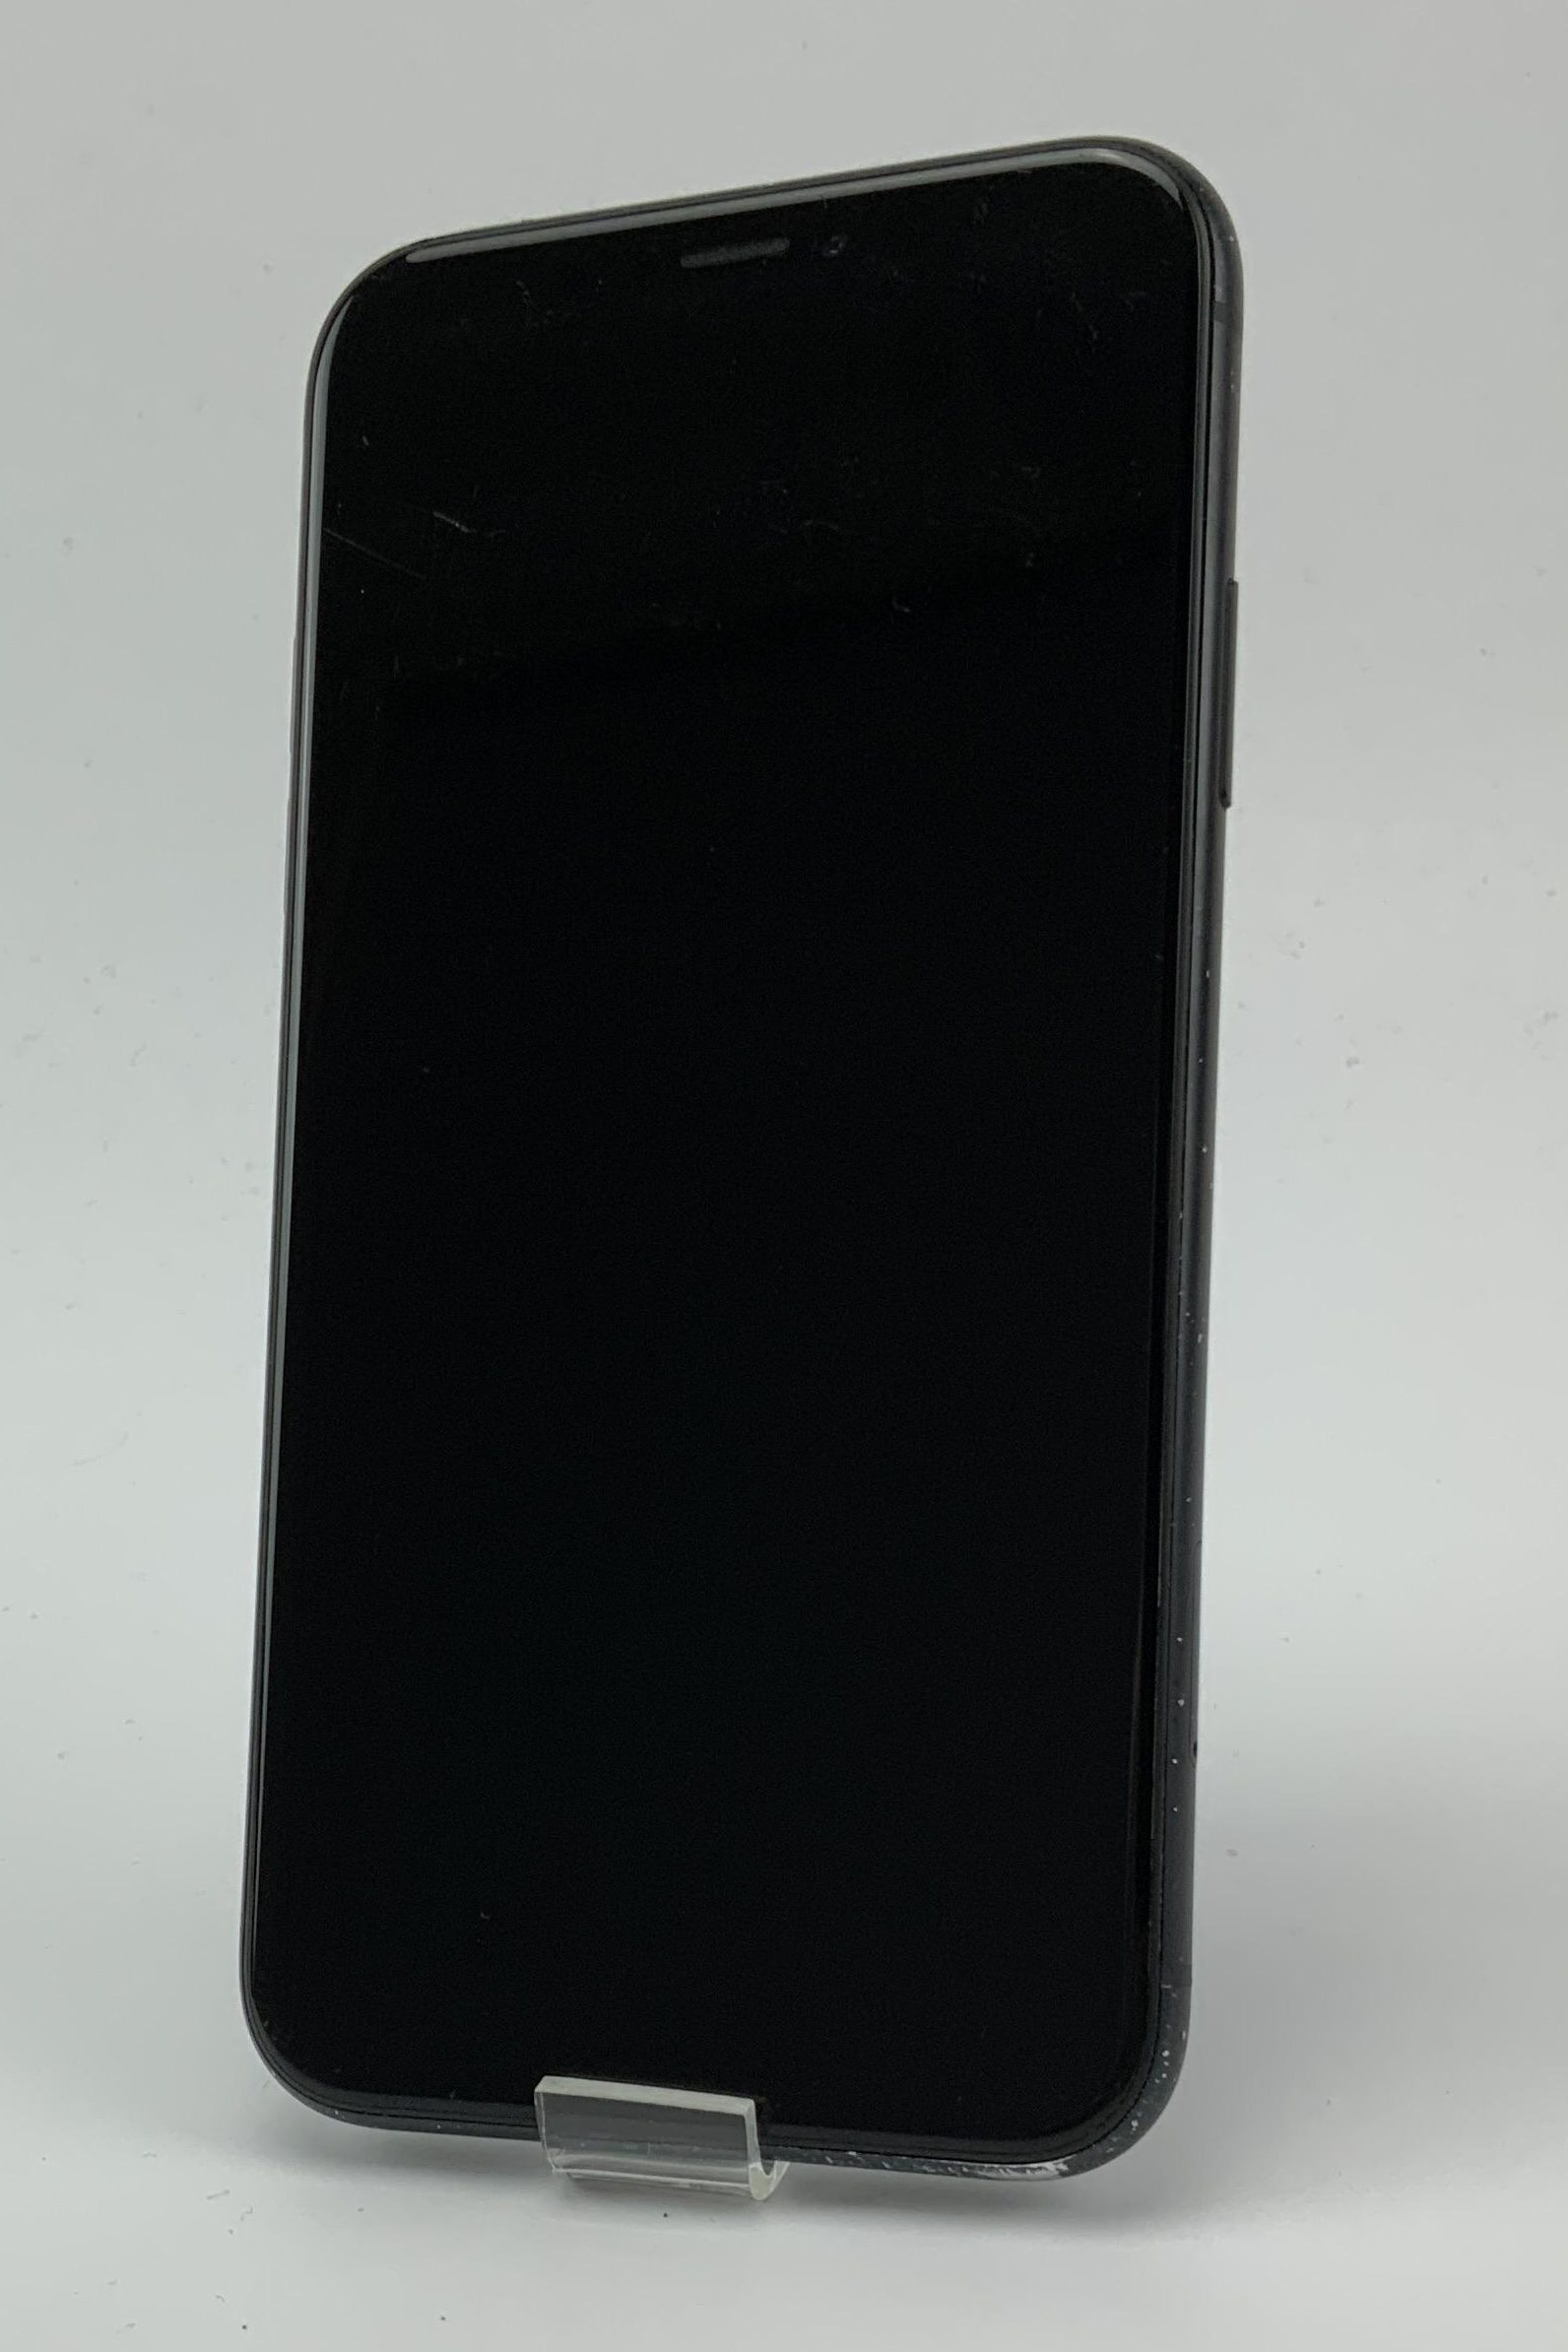 iPhone XR 64GB, 64GB, Black, Afbeelding 1